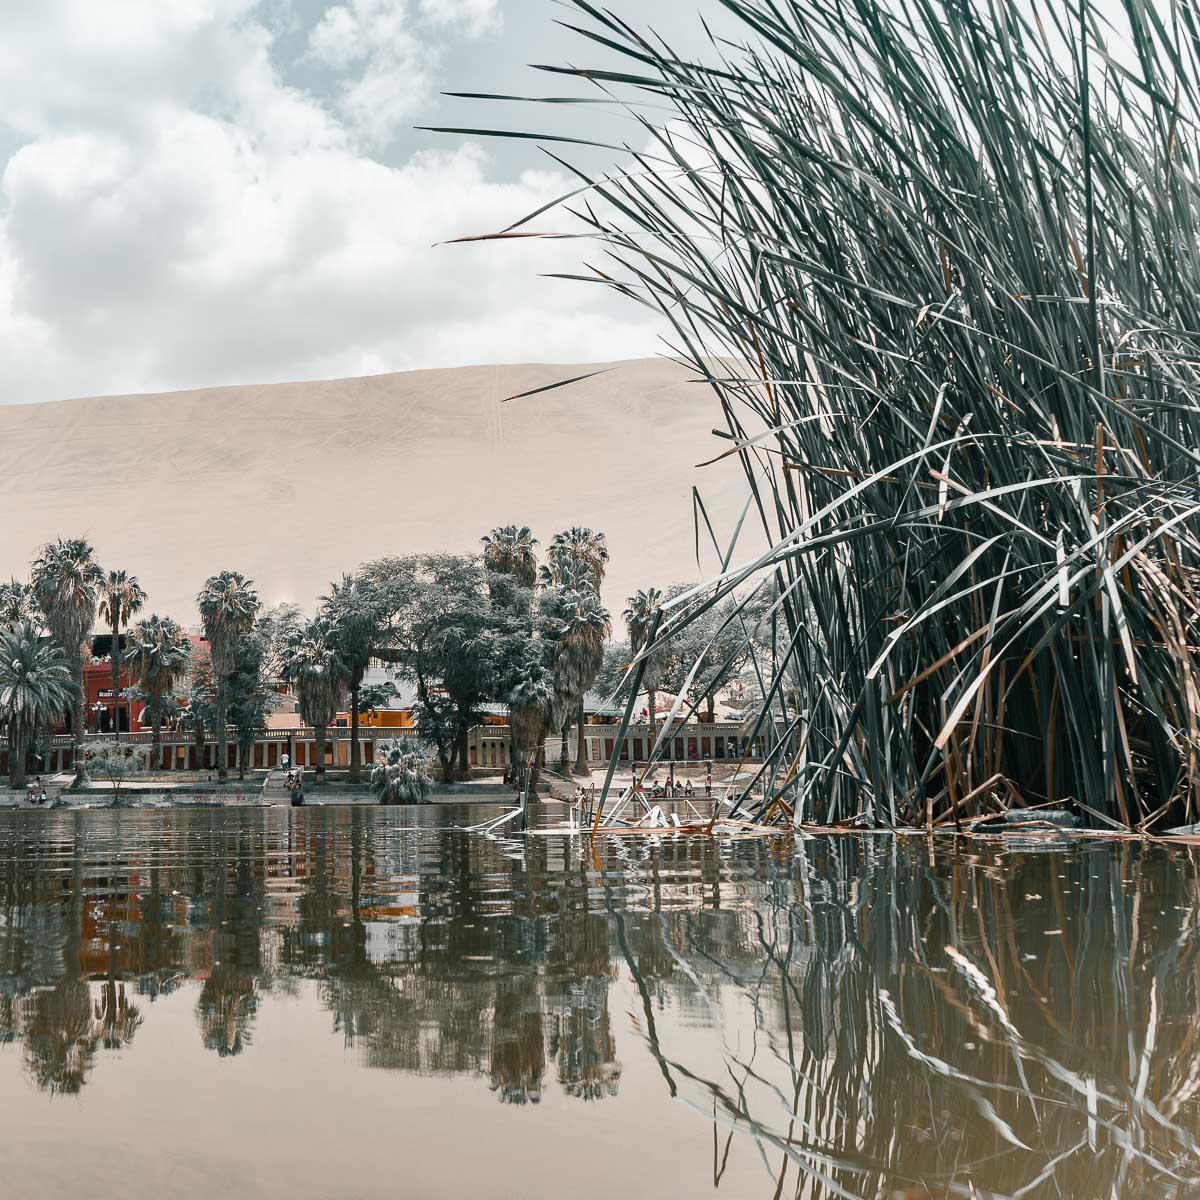 Oasis of Huacahina